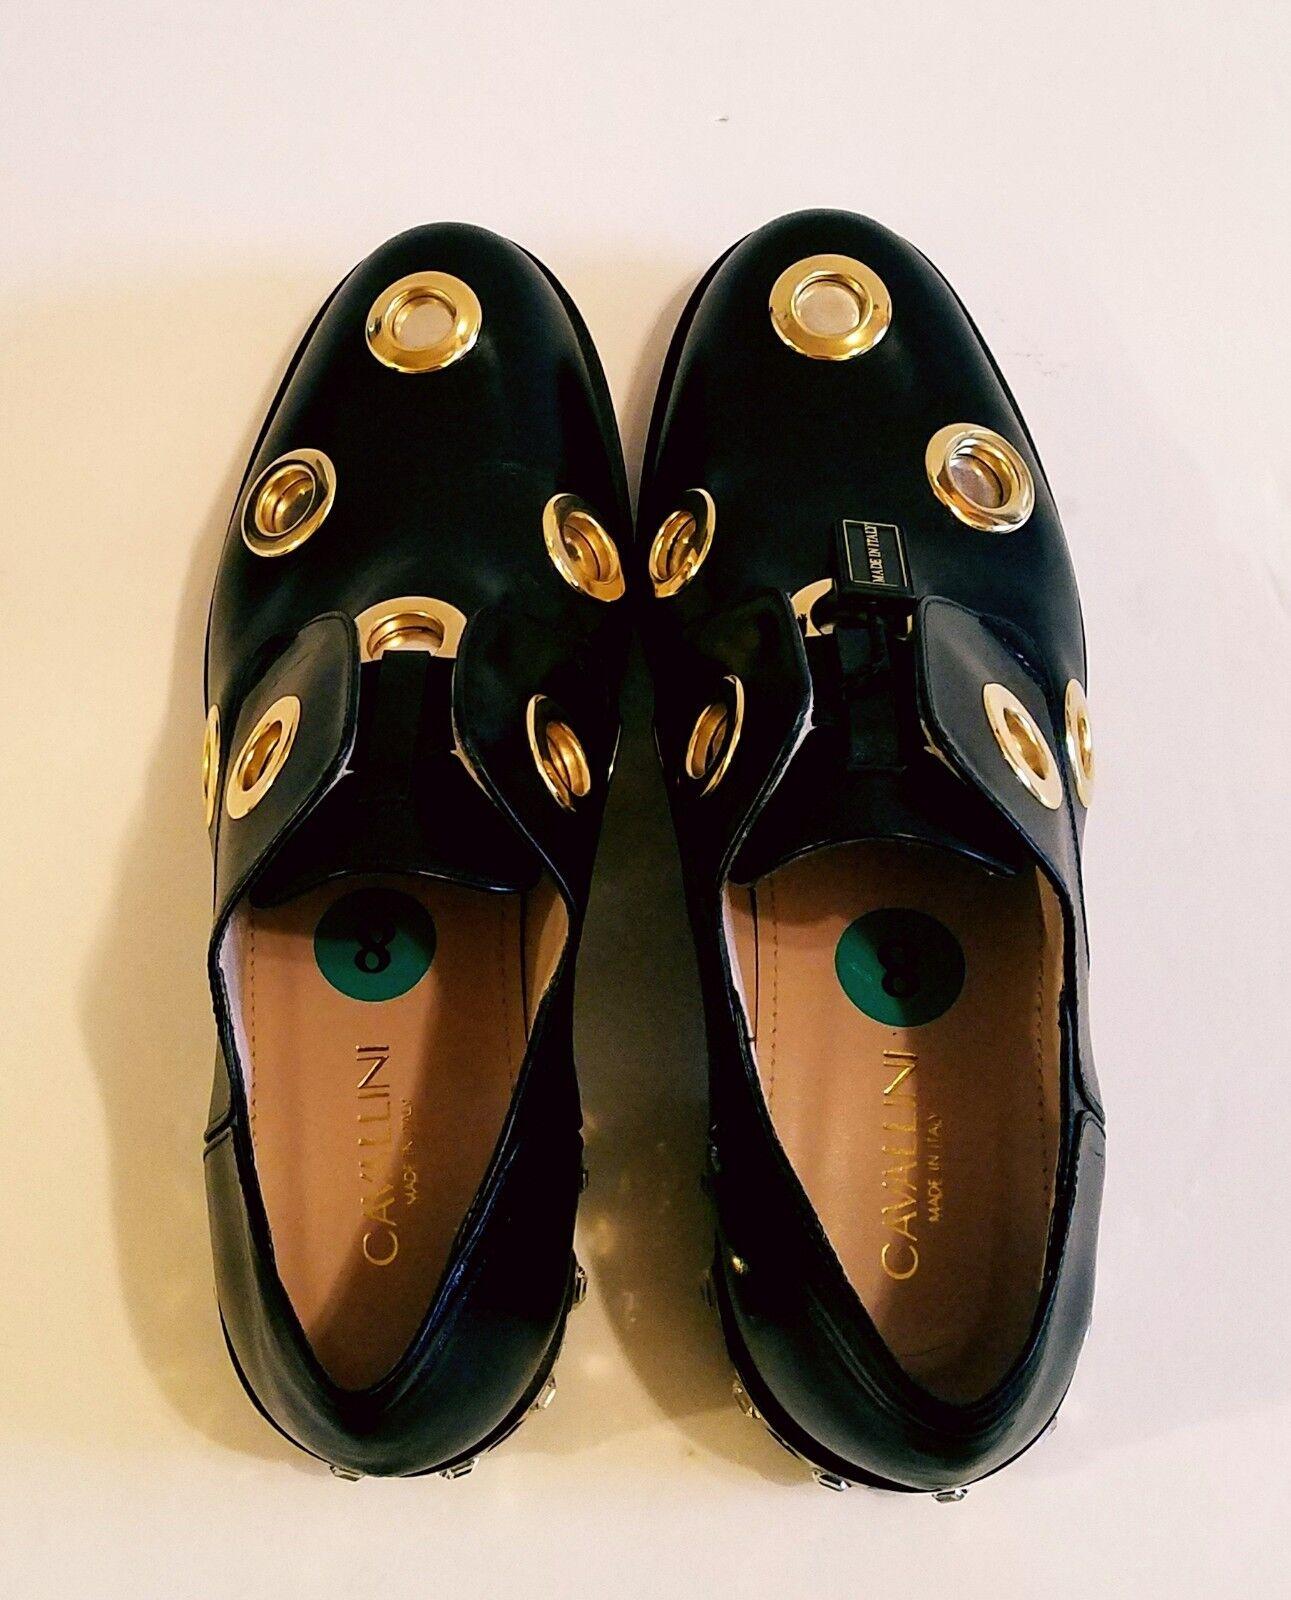 NWOB Cavallini Women's Women's Women's Leather Studded gold heel Loafers shoes Black sz 38.5 (8) 2b1fcf